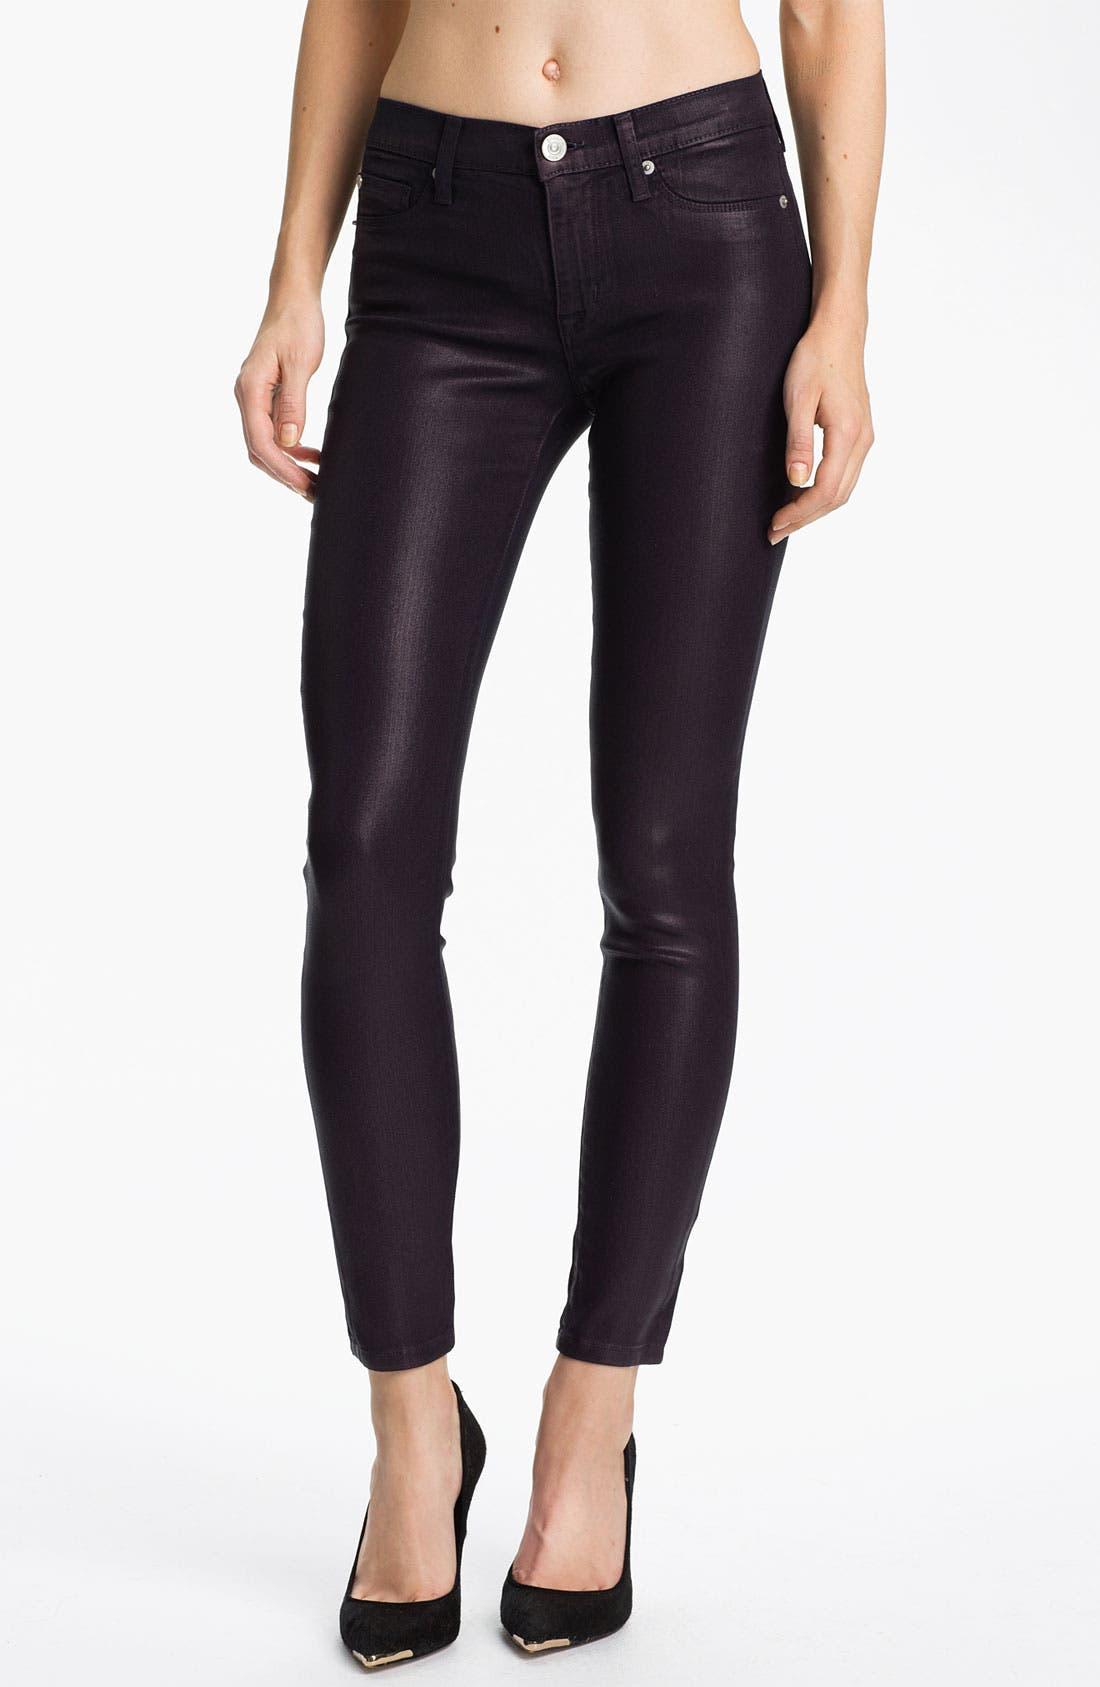 Main Image - Hudson Jeans 'Nico' Mid Rise Skinny Stretch Jeans (Gothic Lotita)